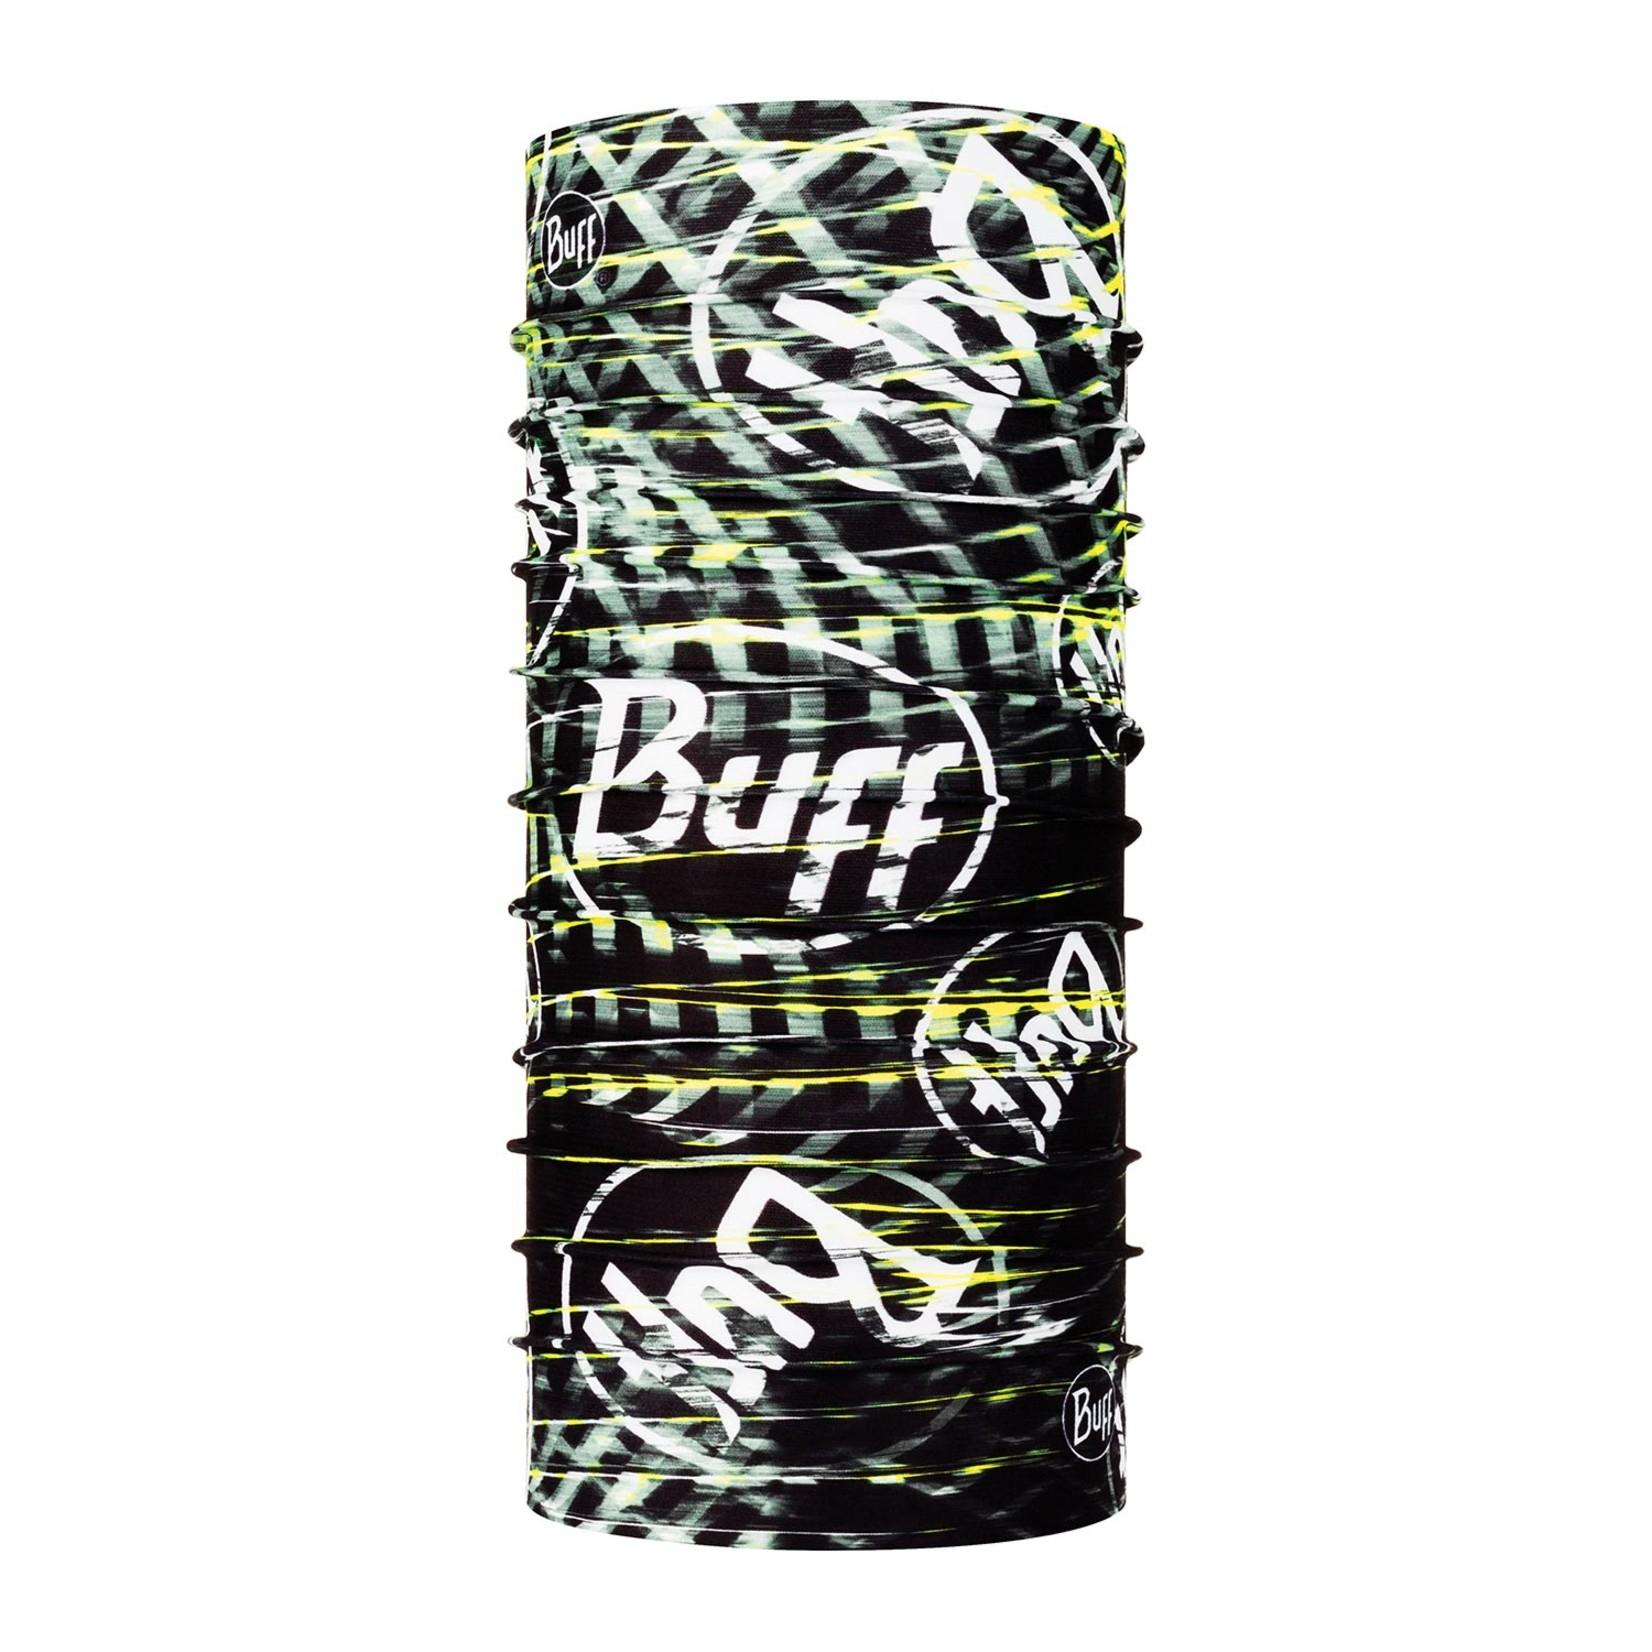 Buff Coolnet UV + Ulnar Black  / Adult